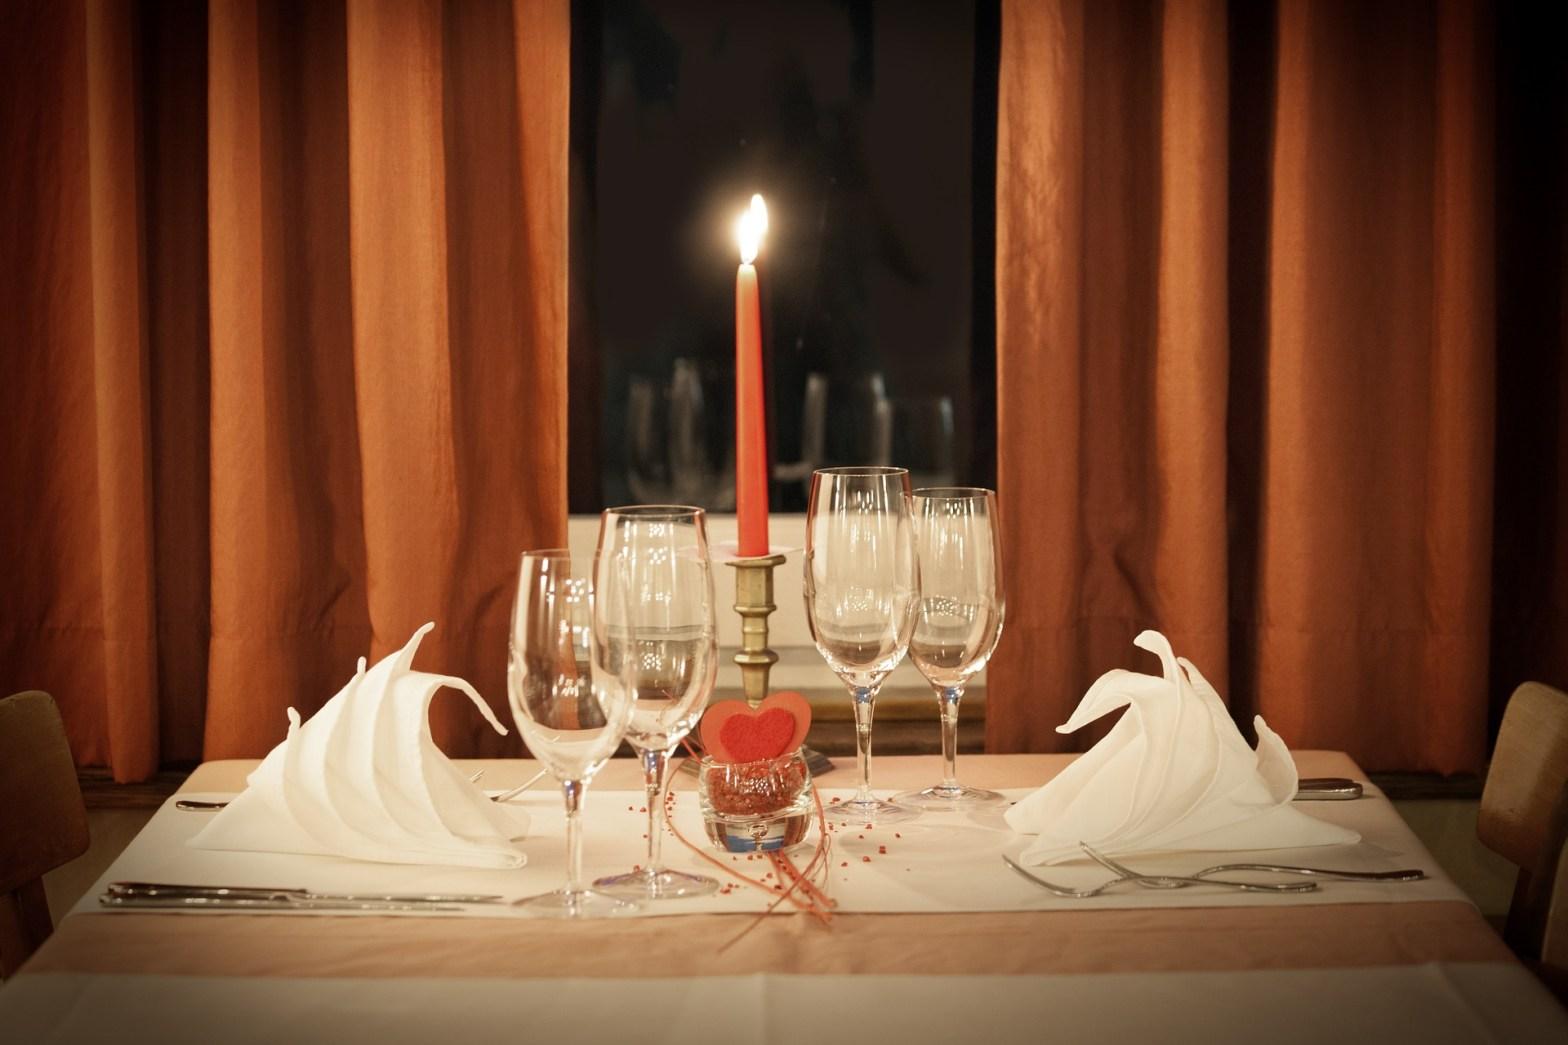 Romantic dinner table dating